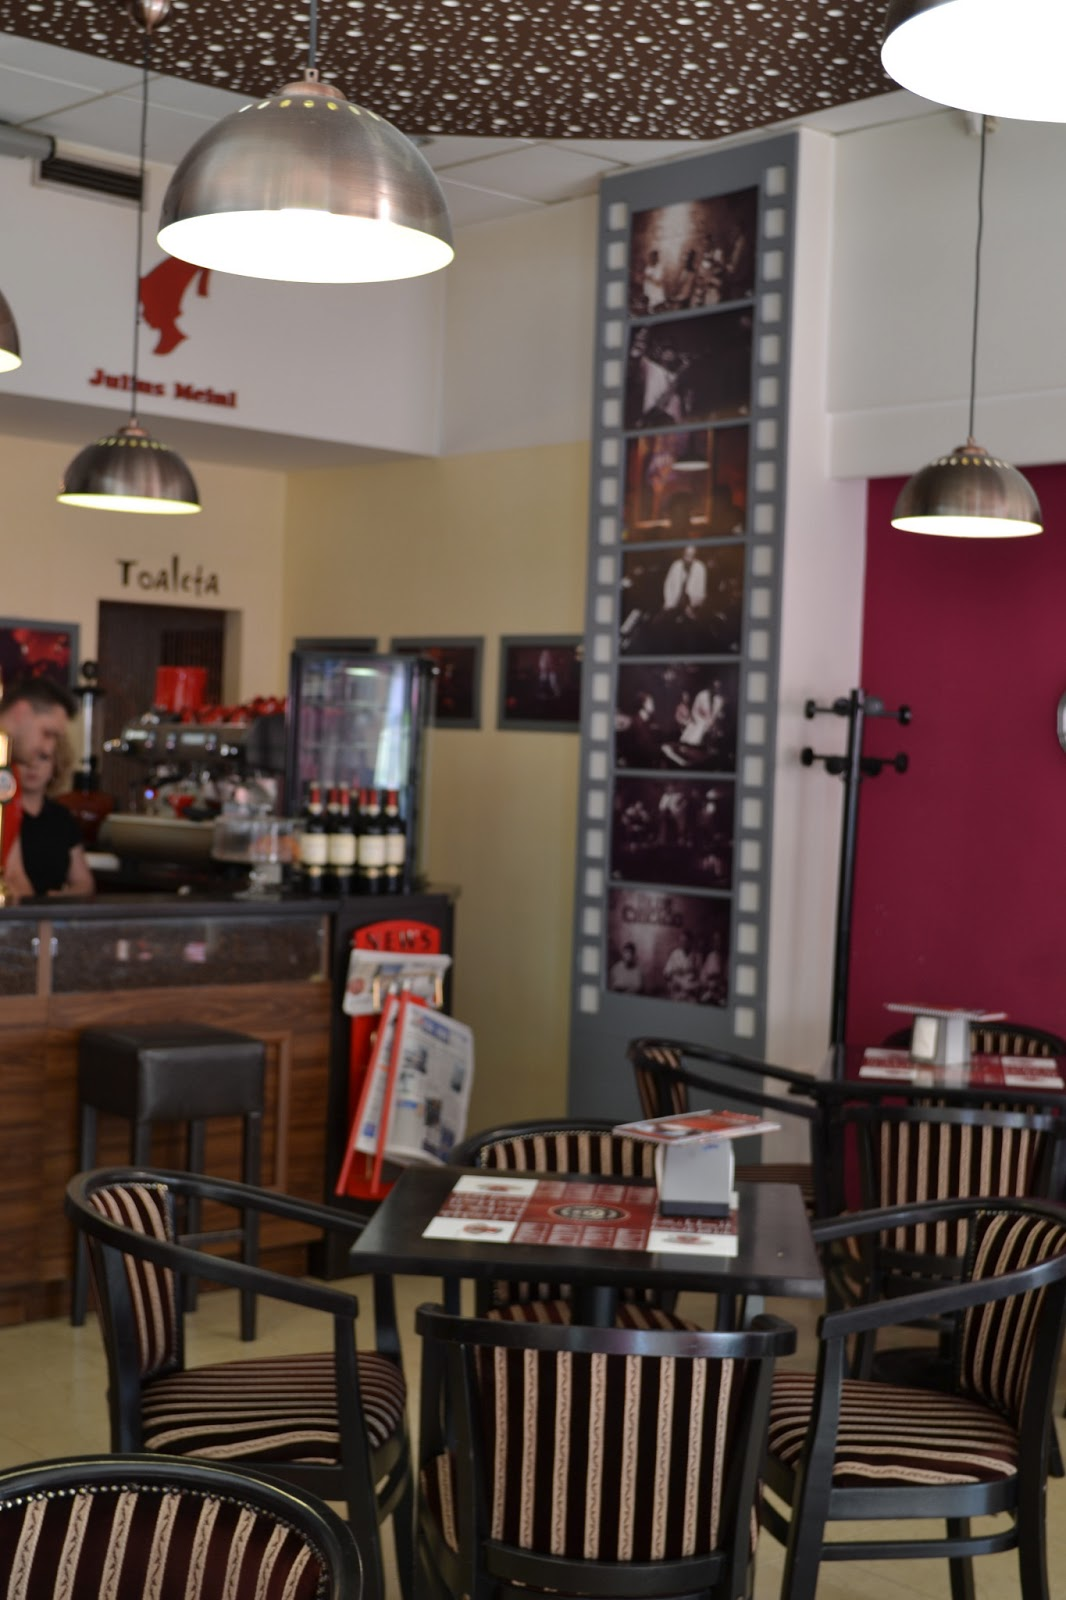 bizz cafe interior cafenea, mobilier design cafea bar